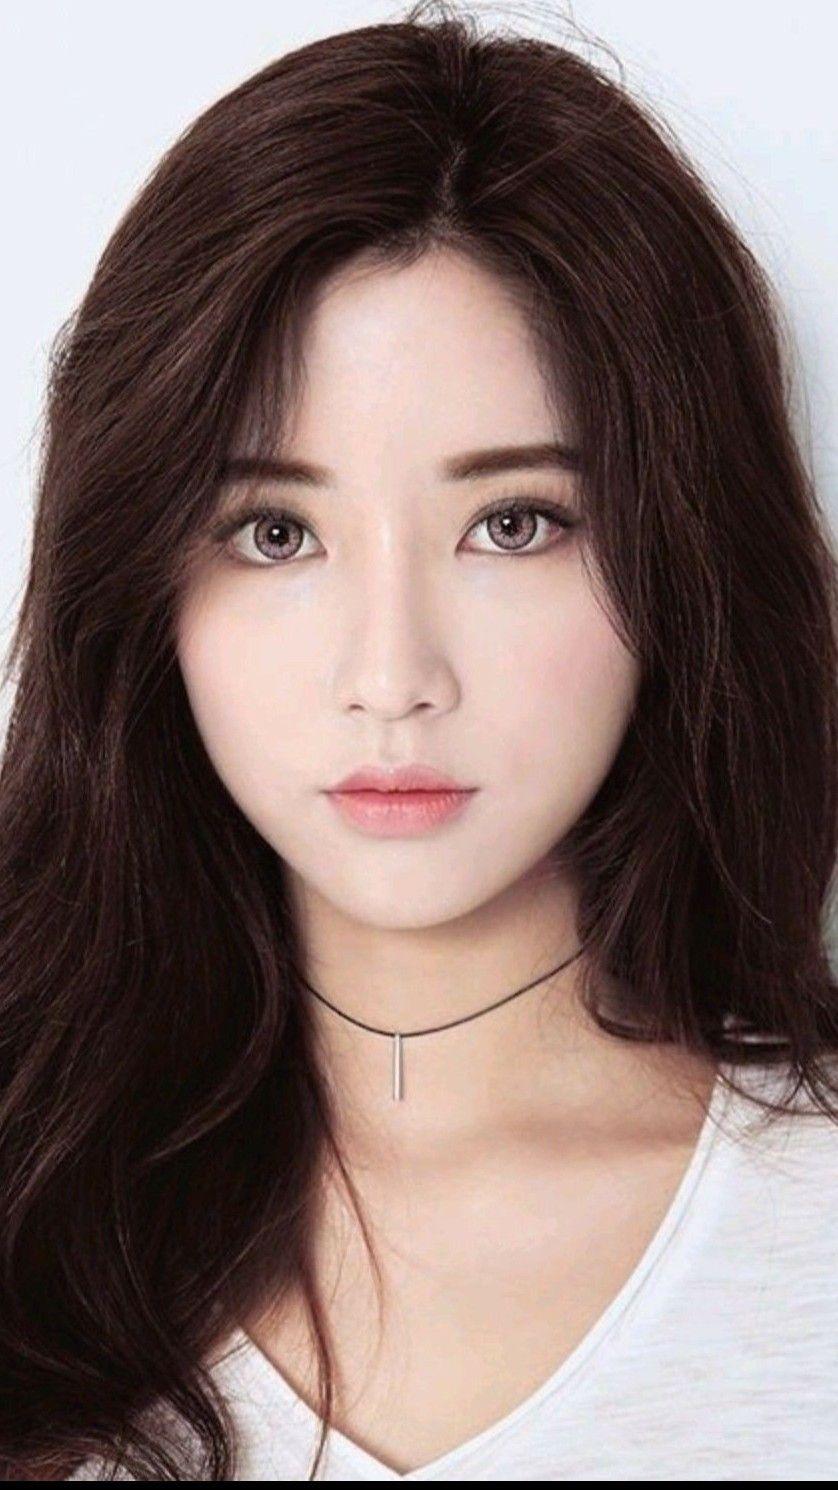 Gorgeous Asian Beauty 4K Ultra HD Mobile Wallpaper